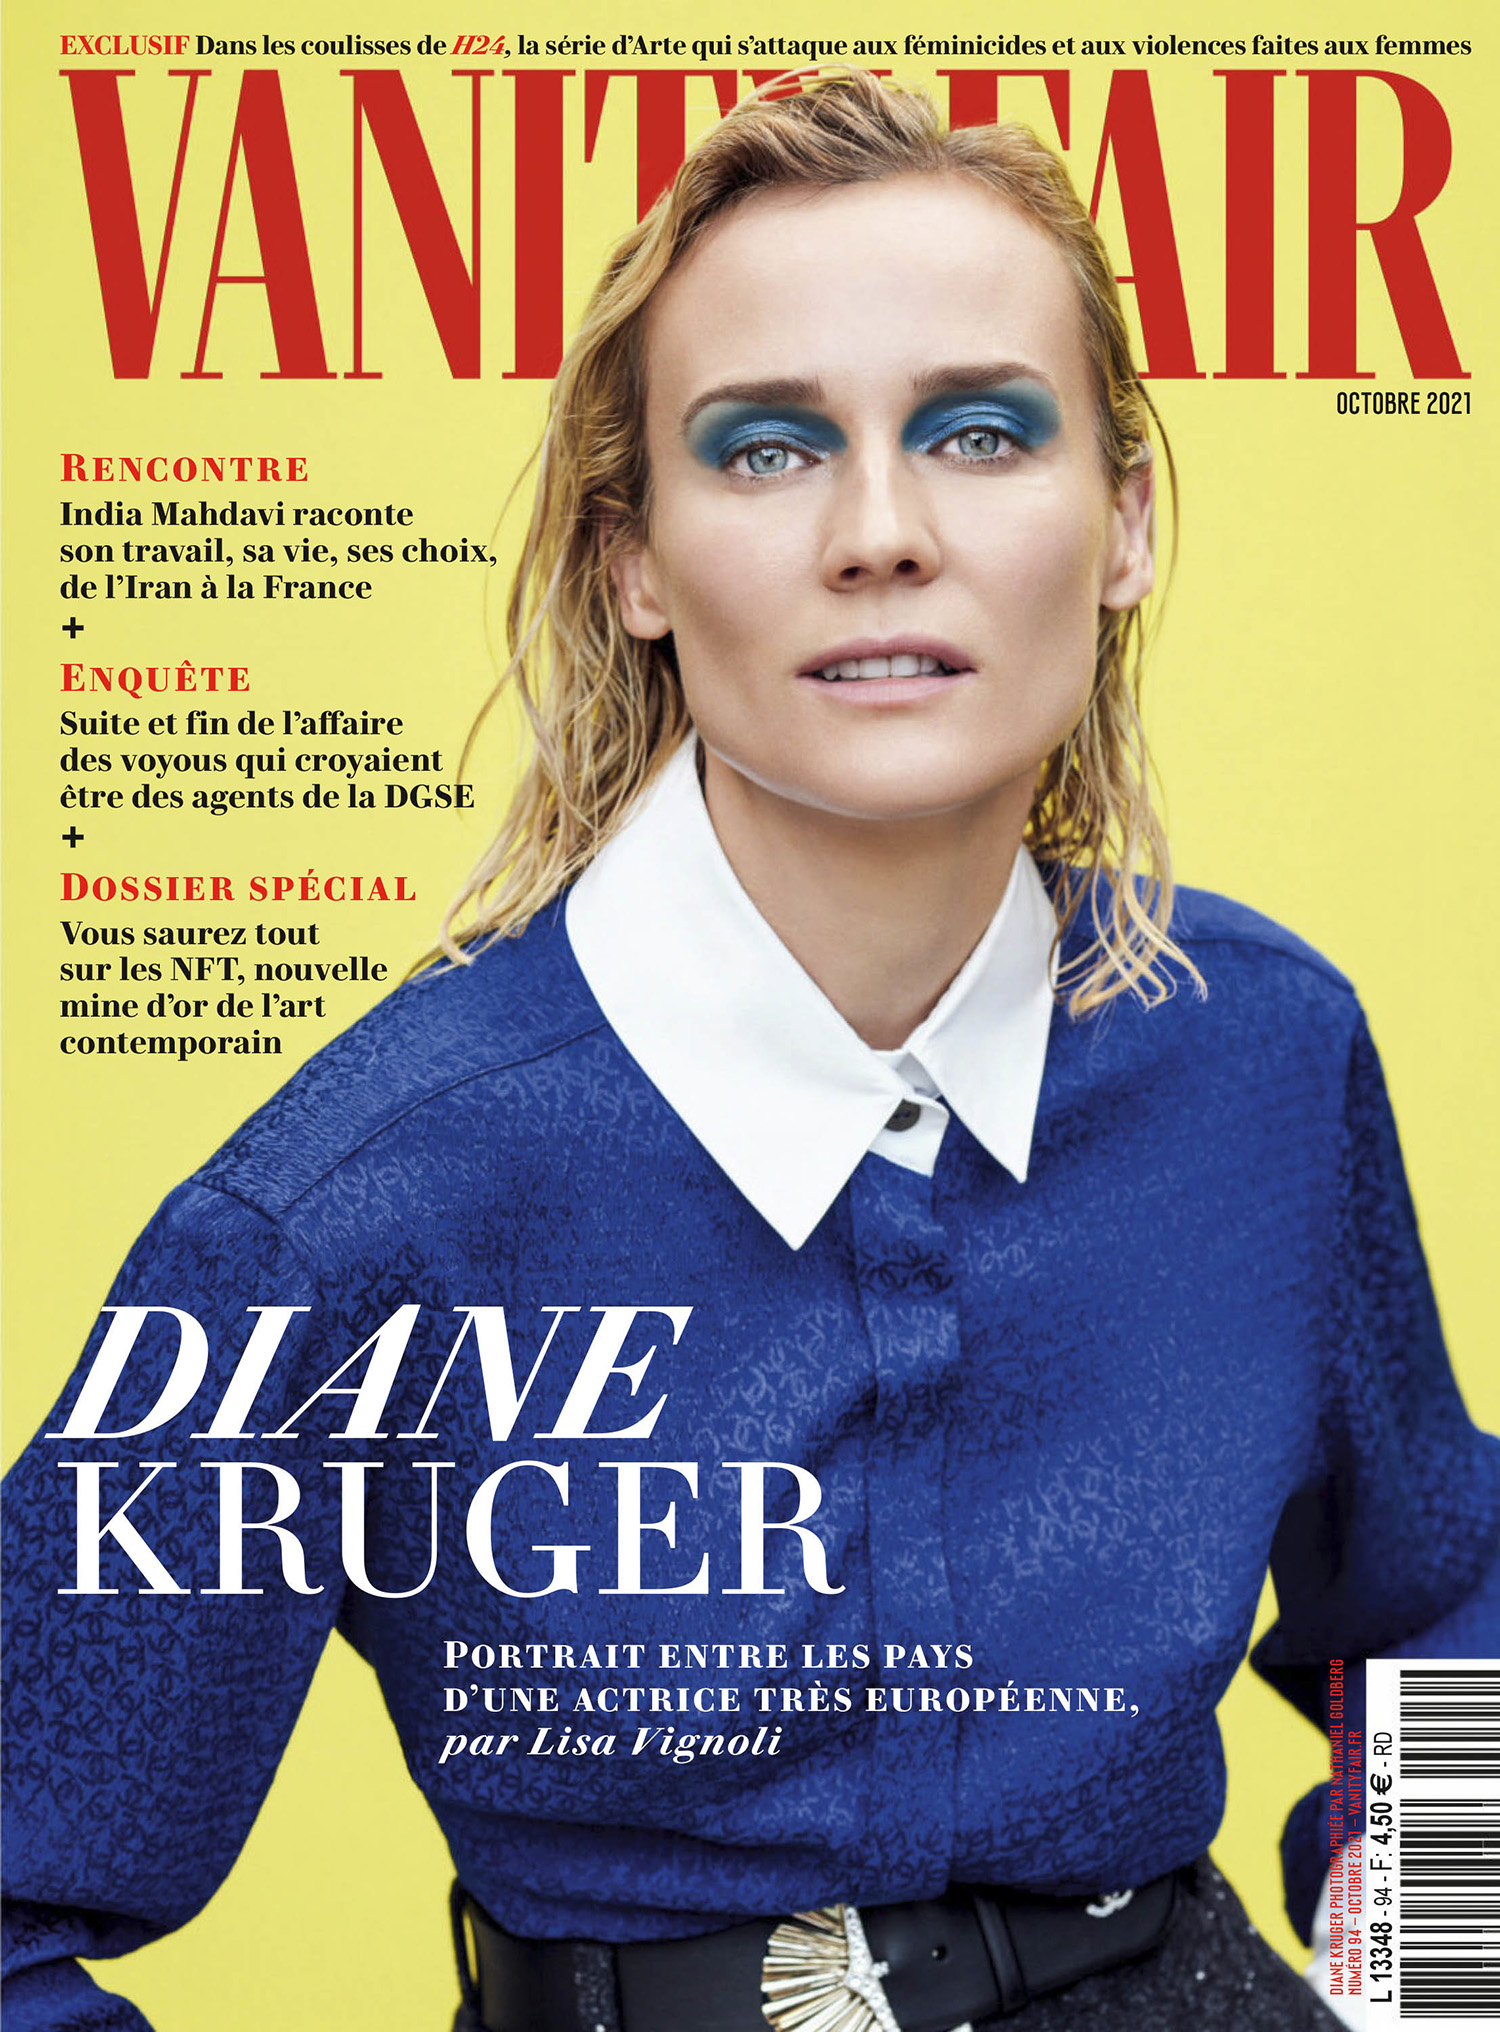 Diane Kruger covers Vanity Fair France October 2021 by Nathaniel Goldberg